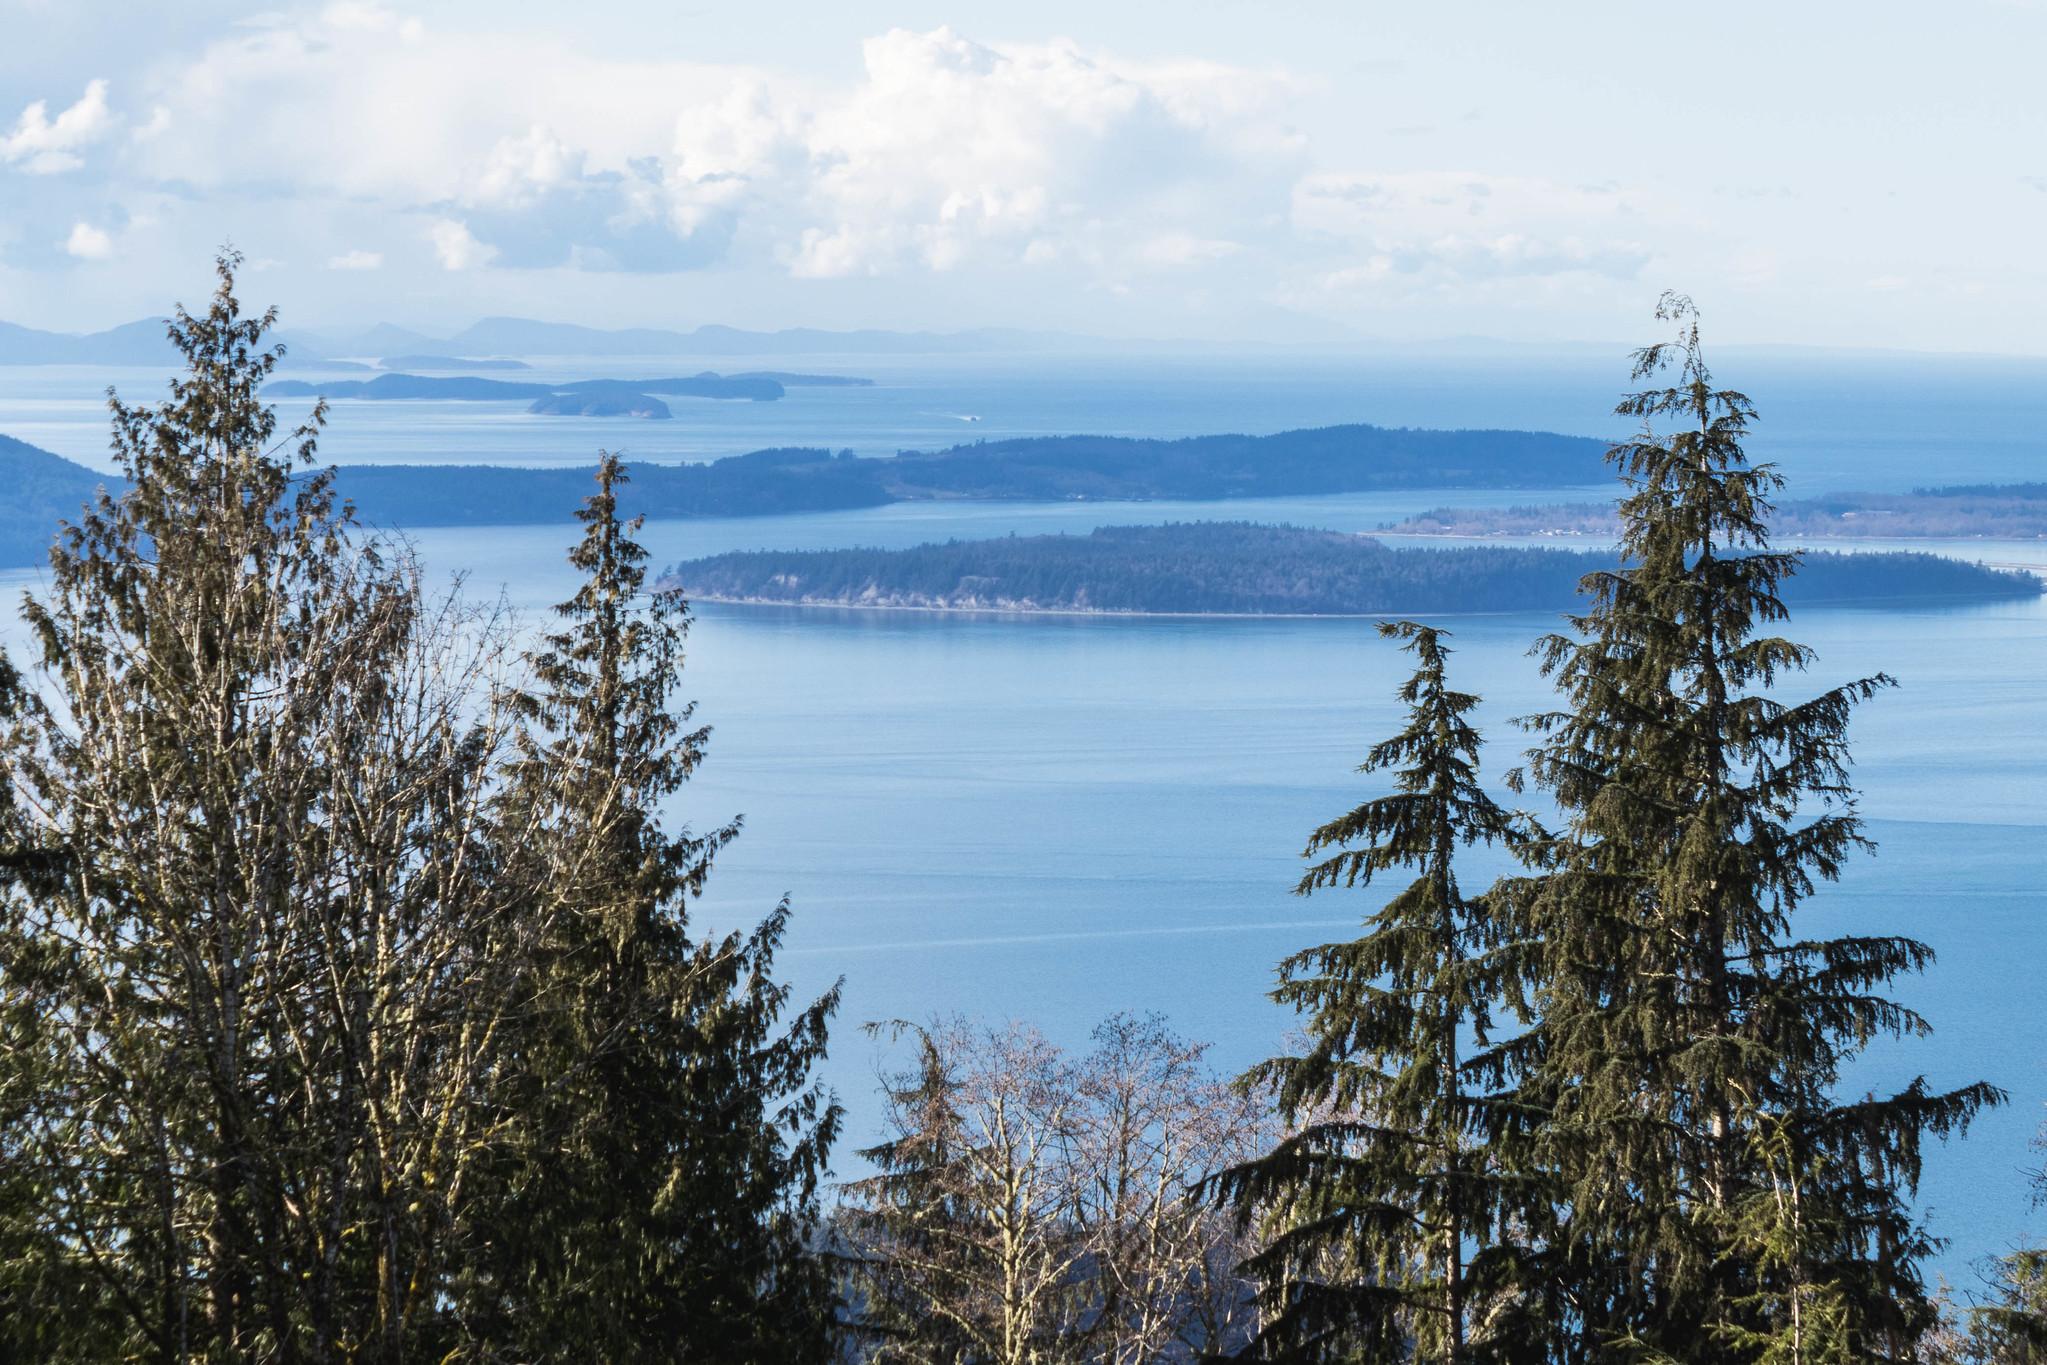 Puget Sound islands